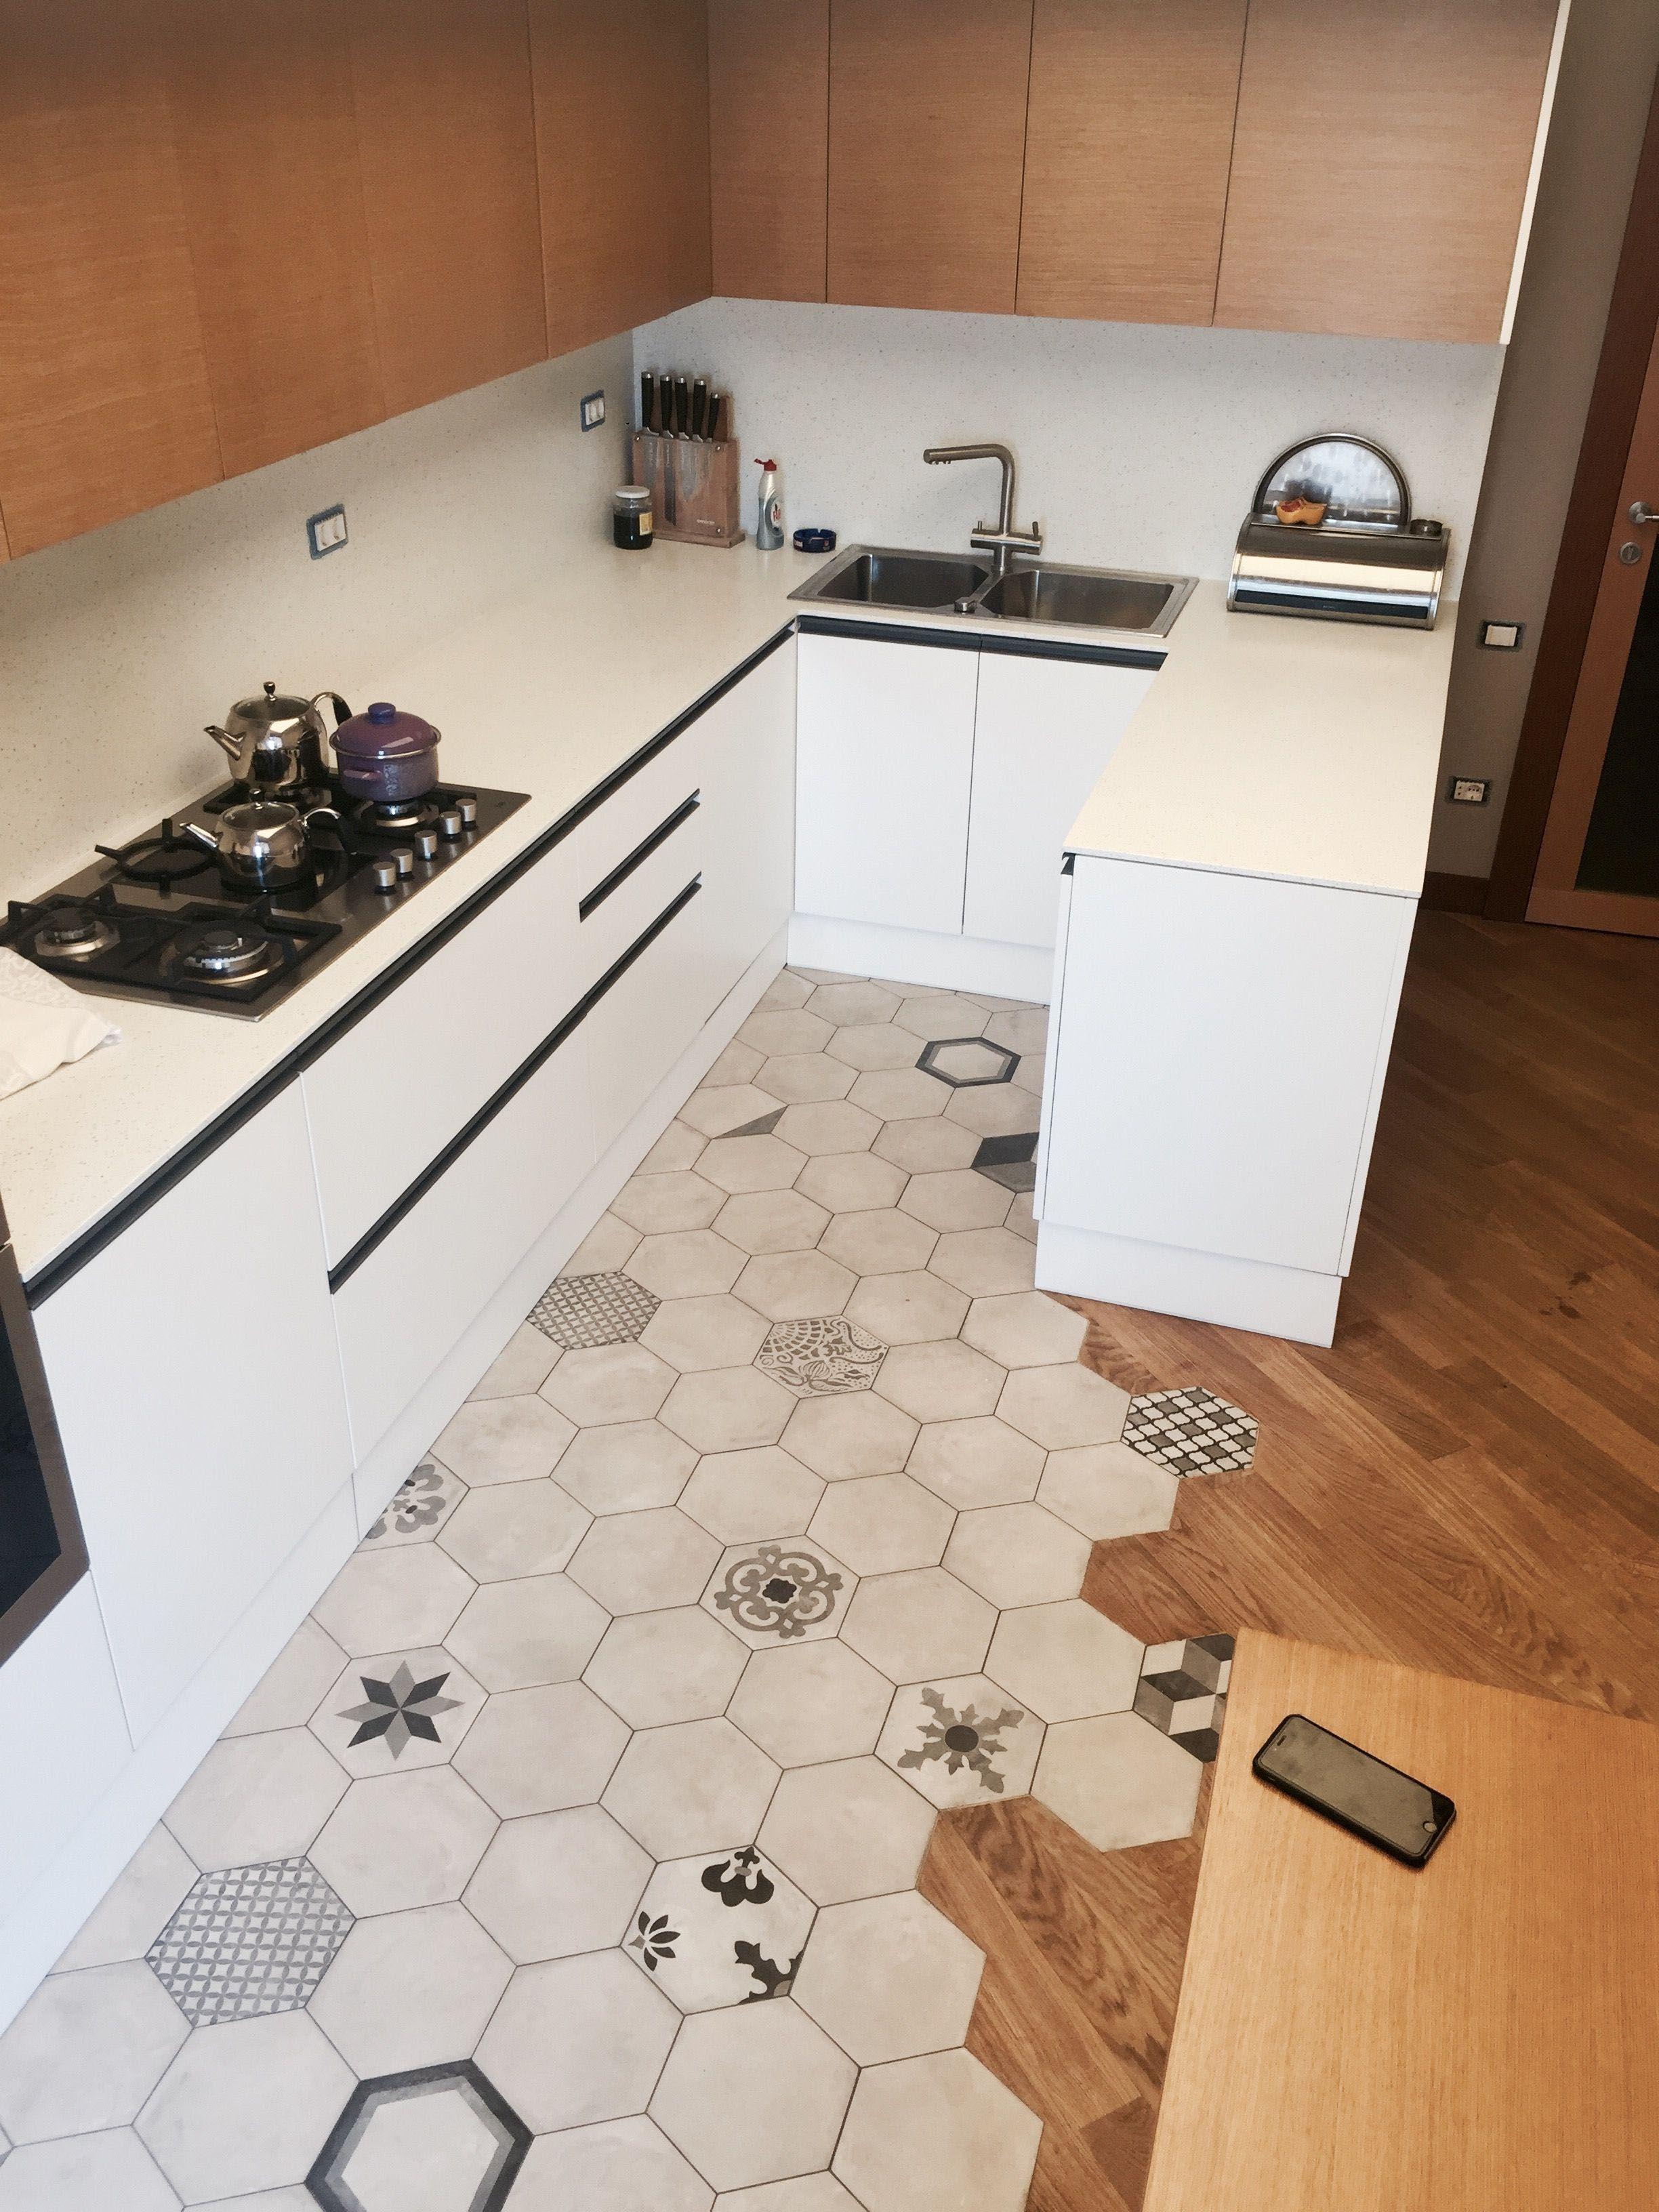 Hardwood Look Tile Floor Covering Assessments Absolute Best Brands Pros Vs Disadvantages Interior Design Kitchen Kitchen Flooring Kitchen Remodel Small